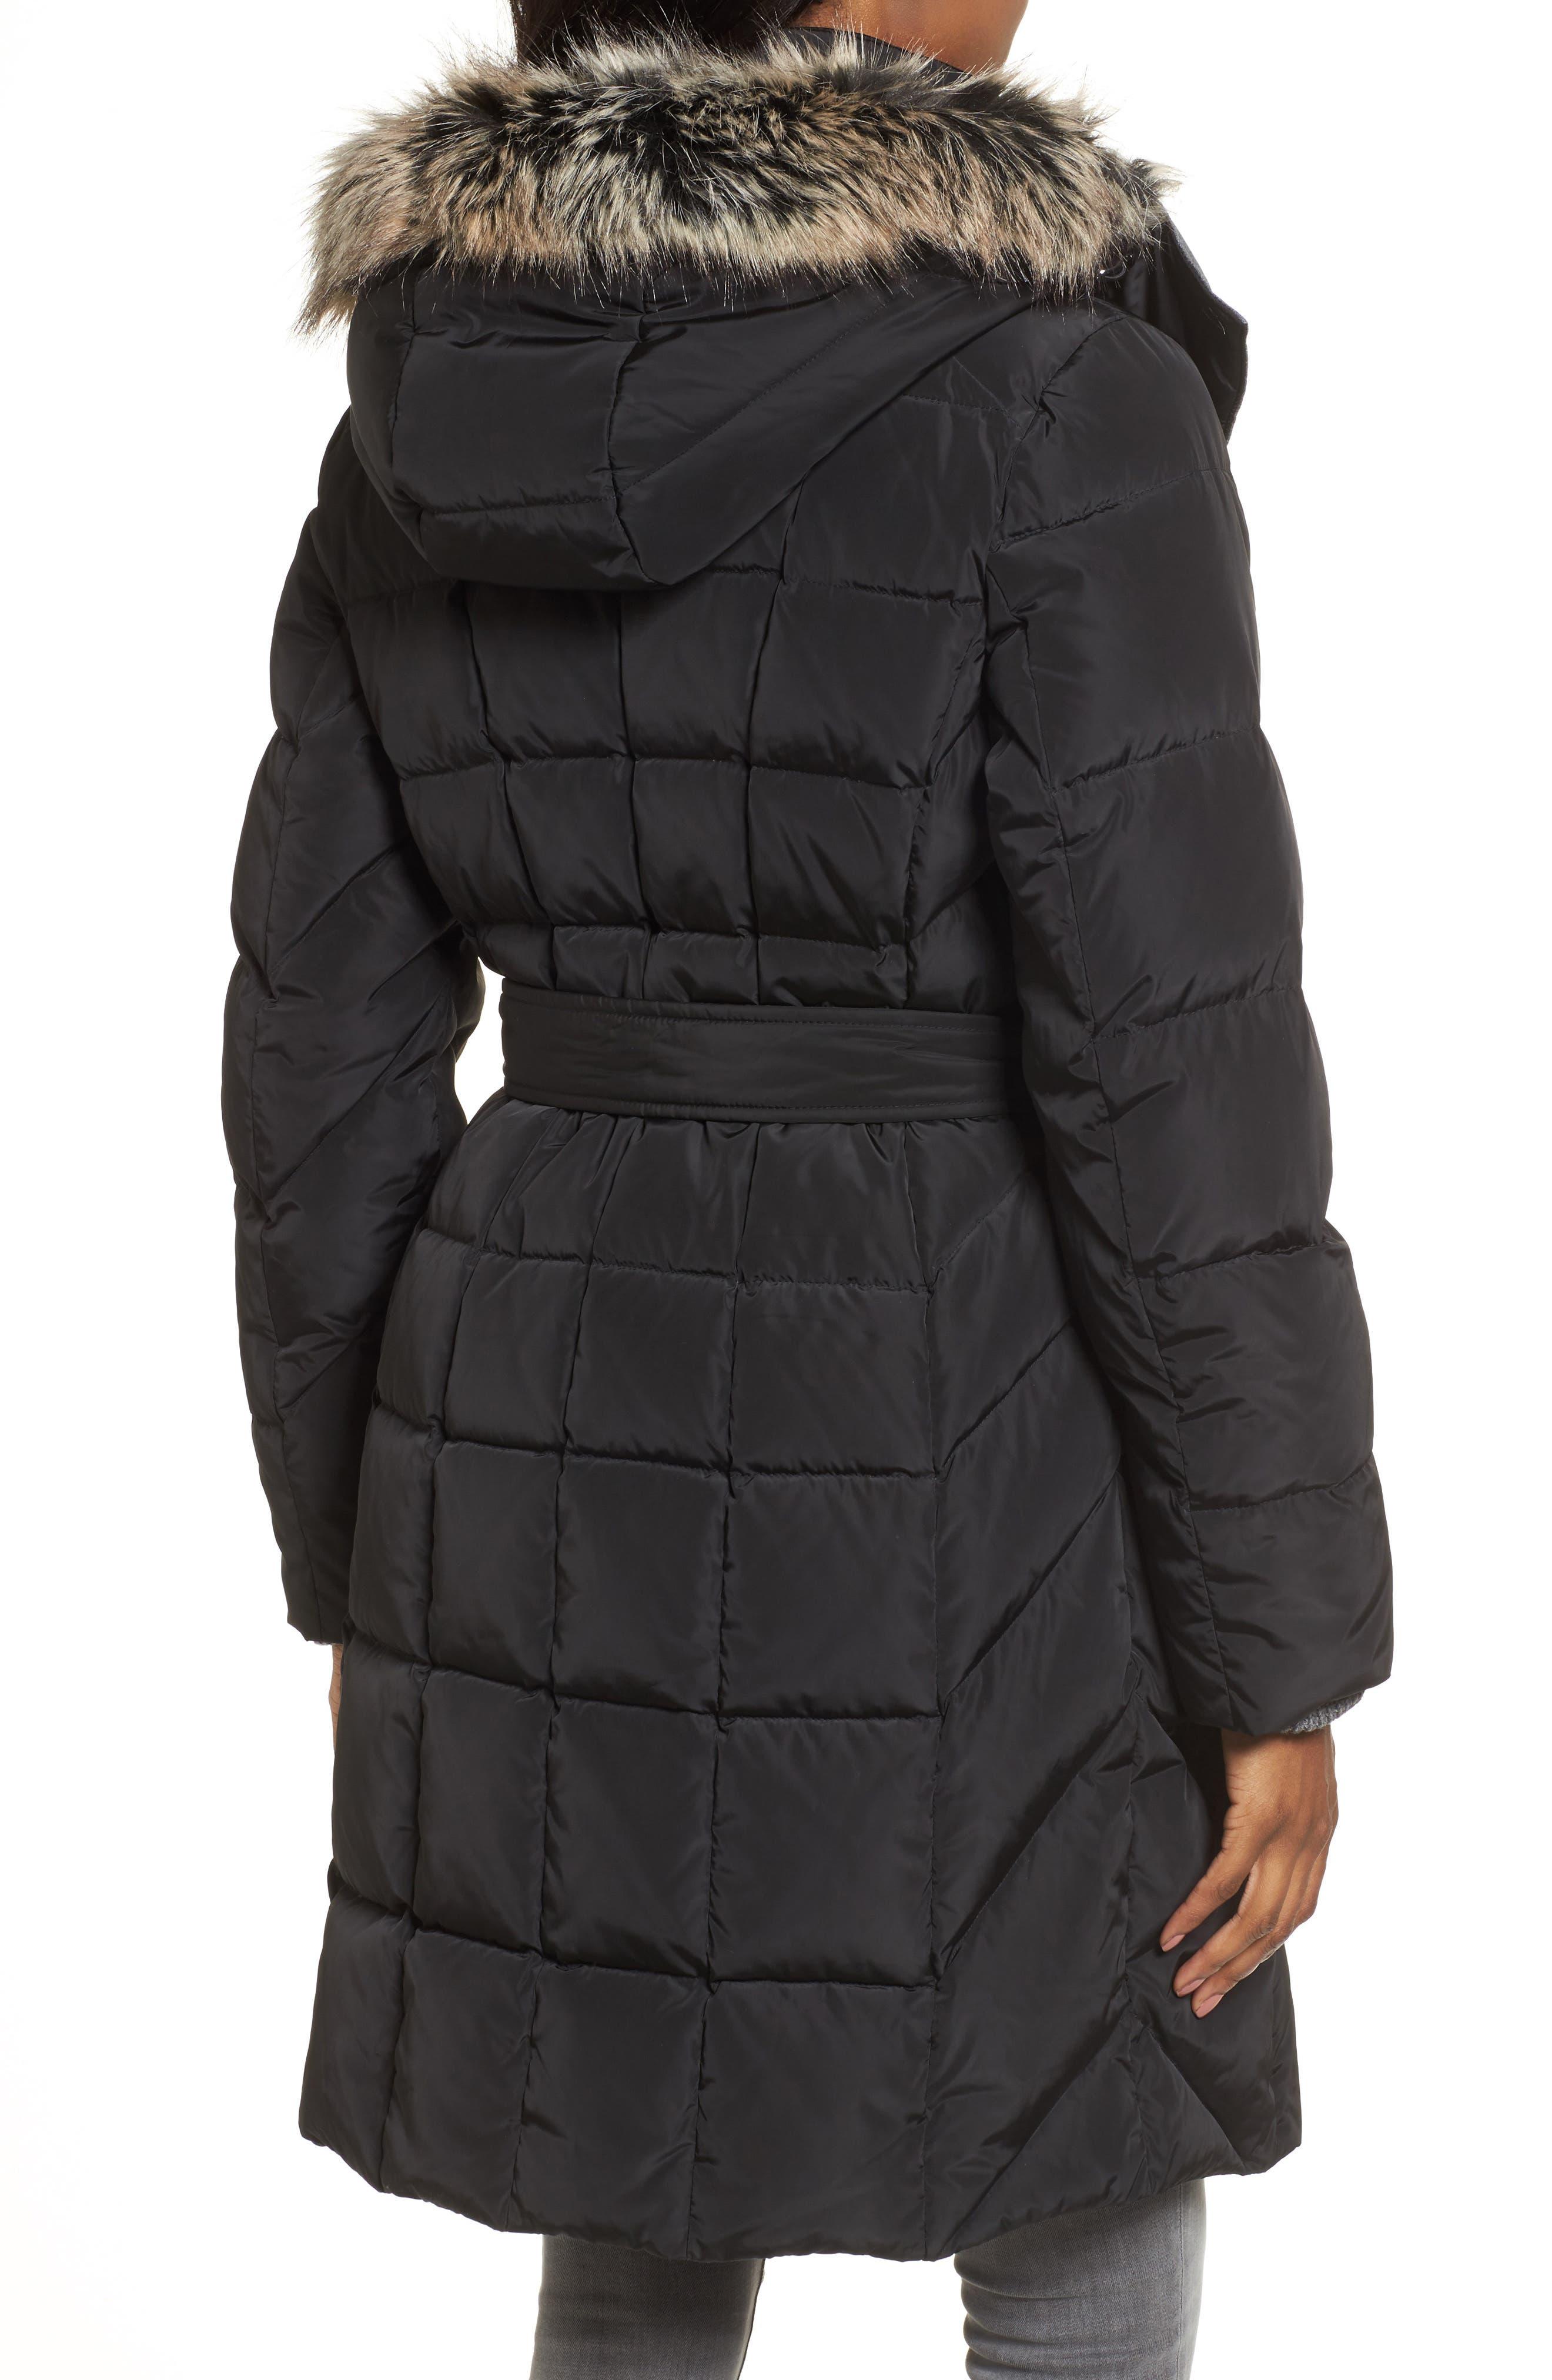 Alternate Image 2  - London Fog Down Coat with Faux Fur Trim